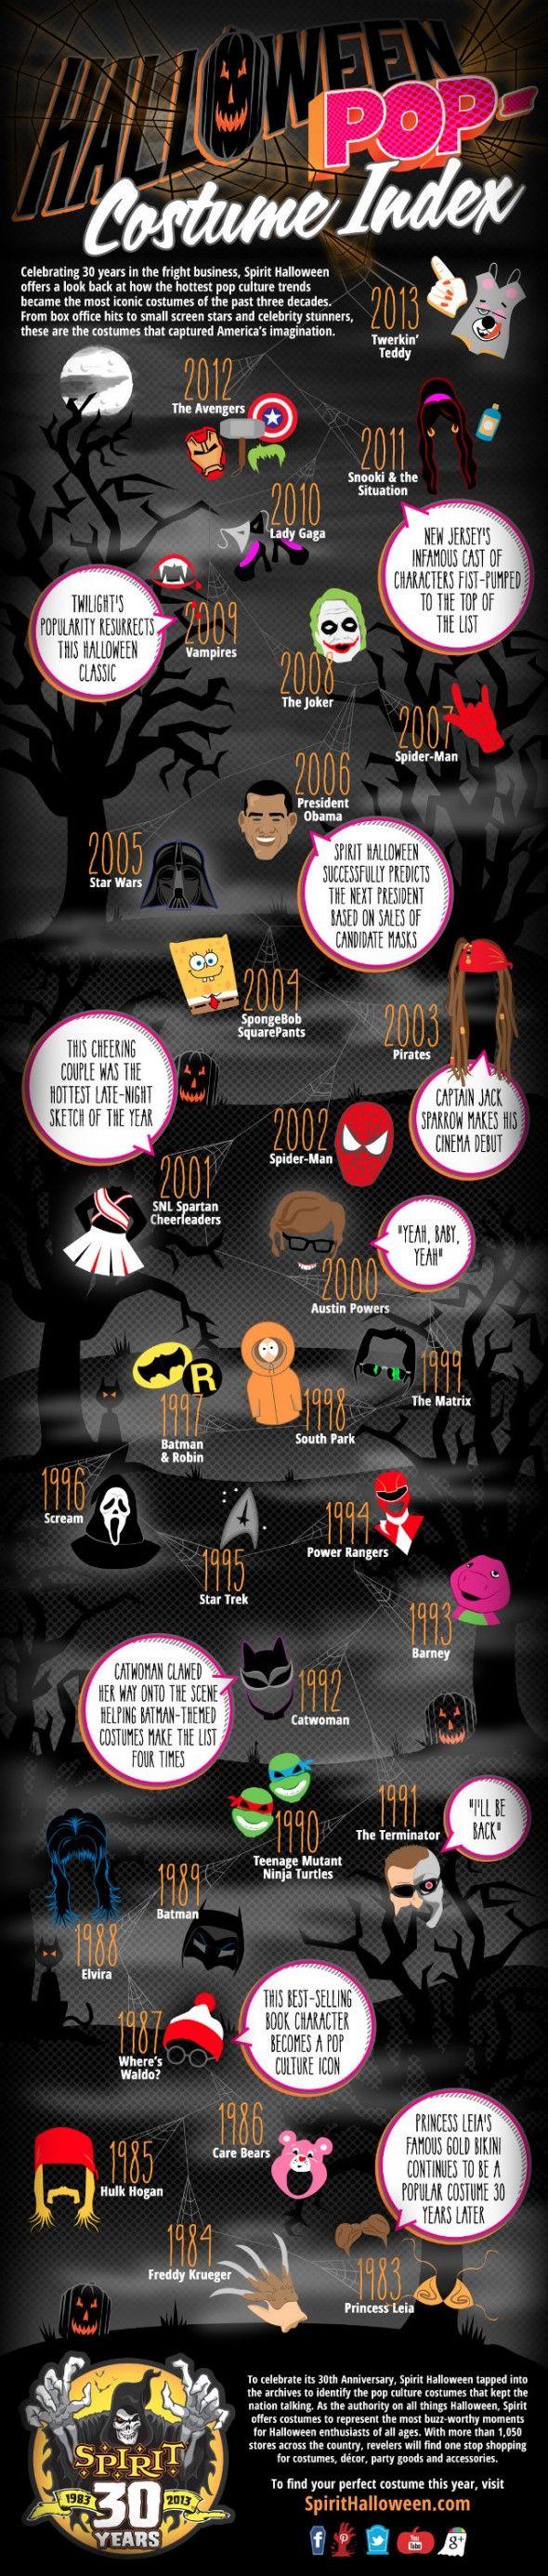 Best 25+ Popular halloween costumes ideas on Pinterest | Pretty ...